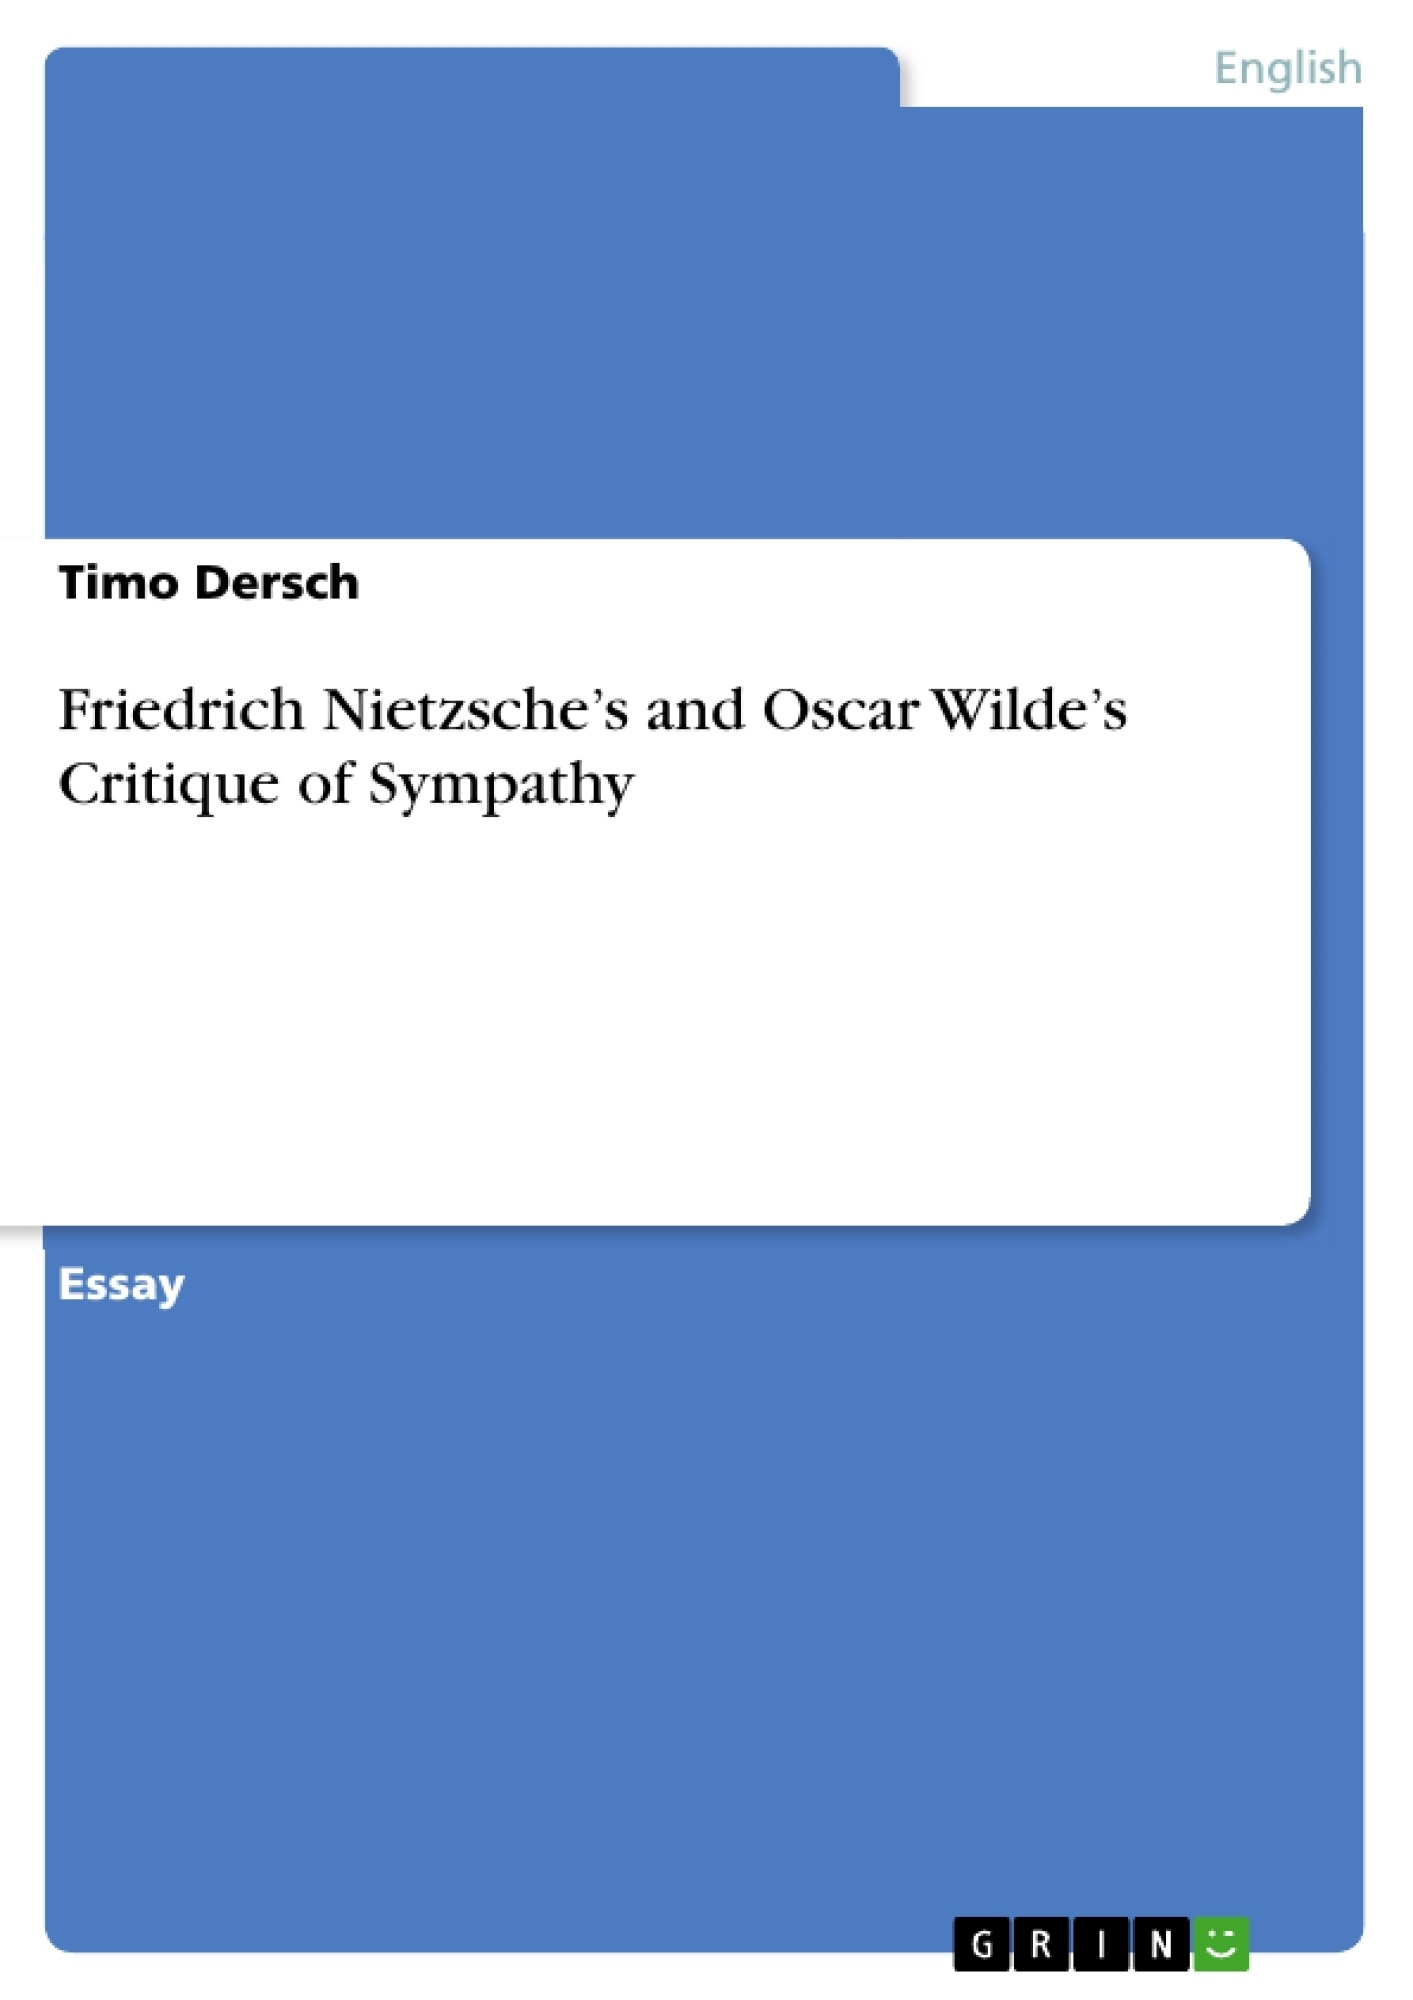 Title: Friedrich Nietzsche's and Oscar Wilde's Critique of Sympathy